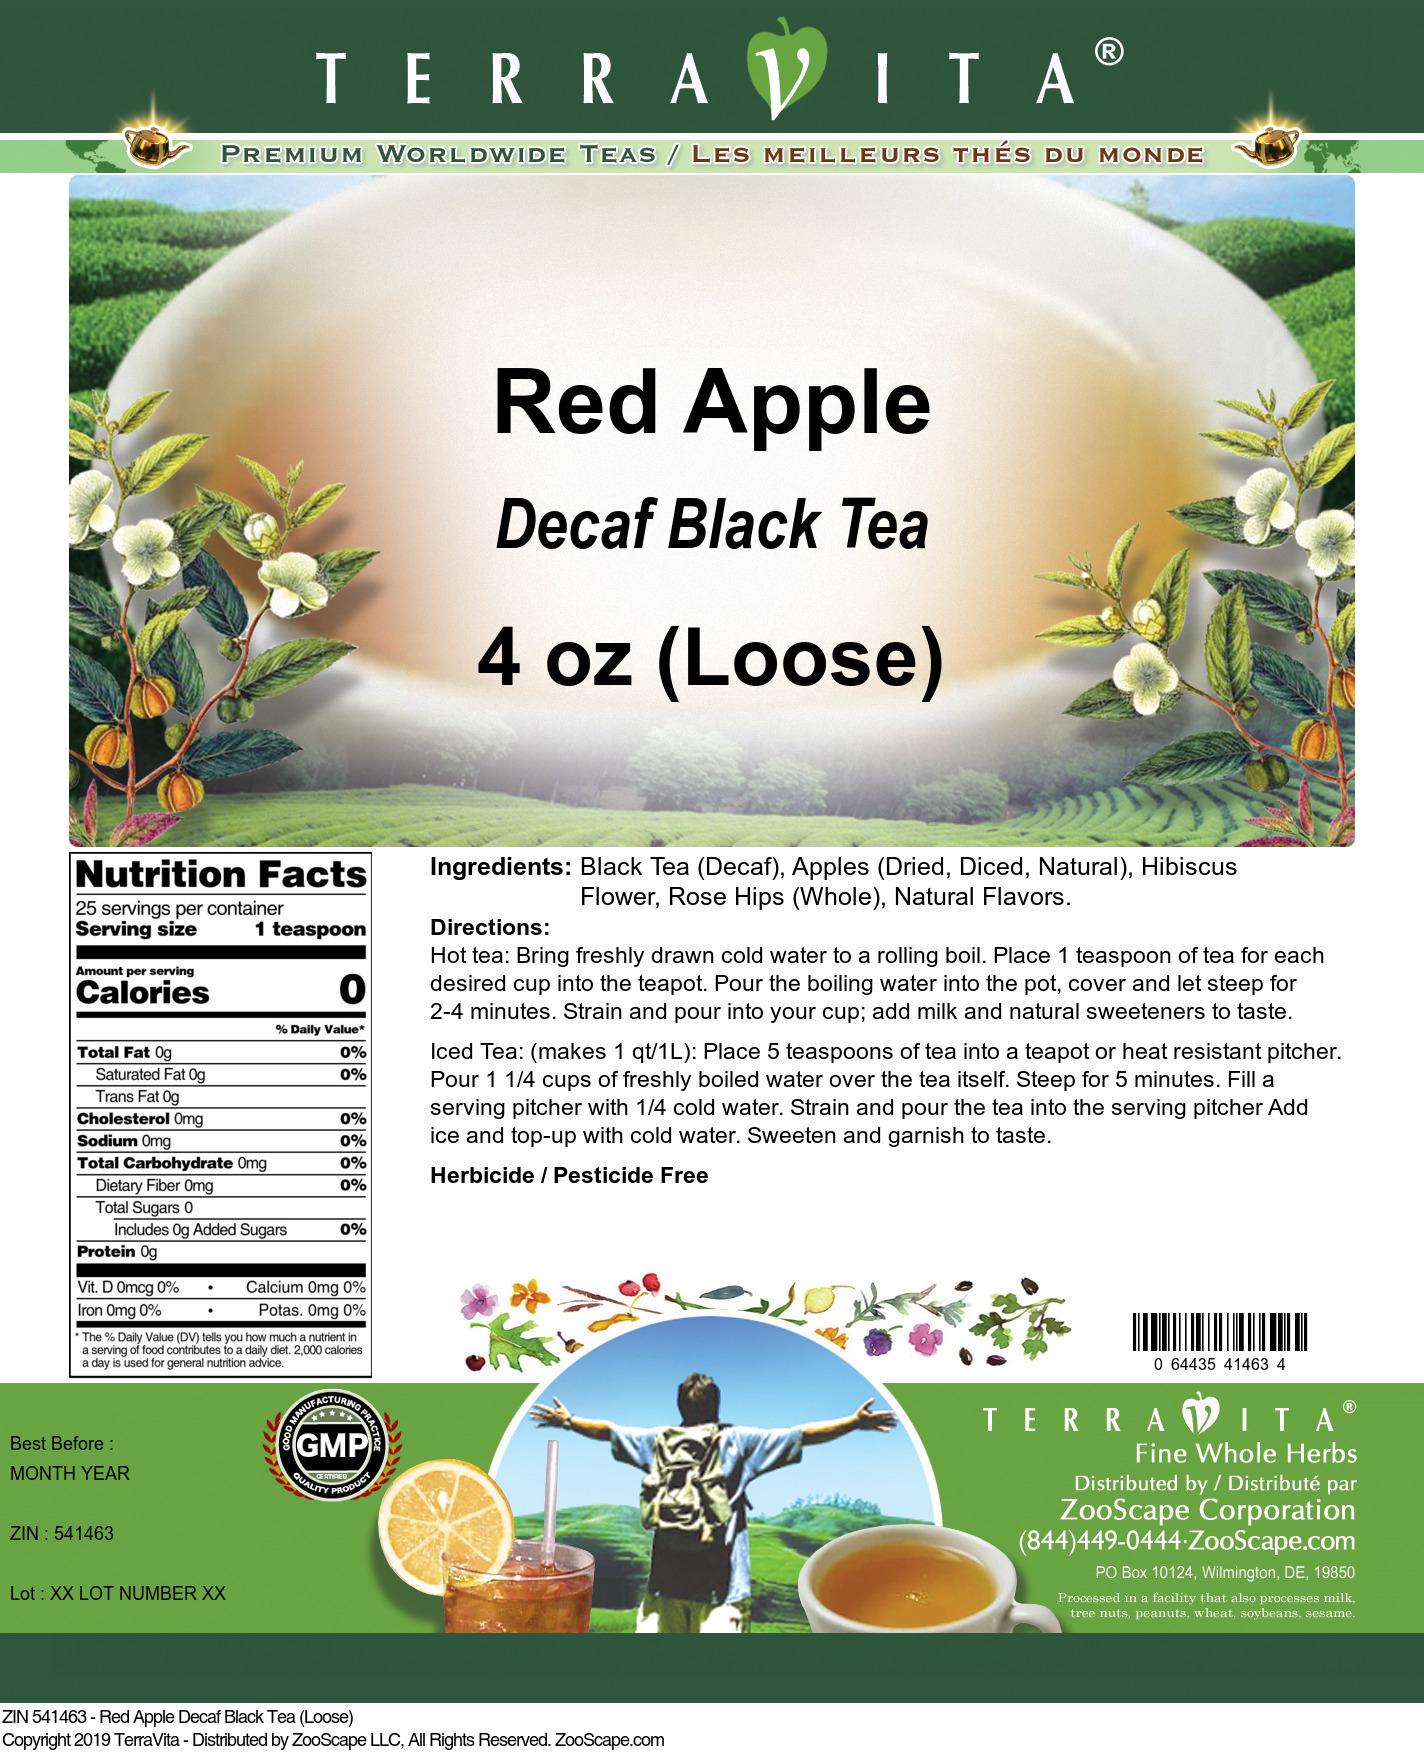 Red Apple Decaf Black Tea